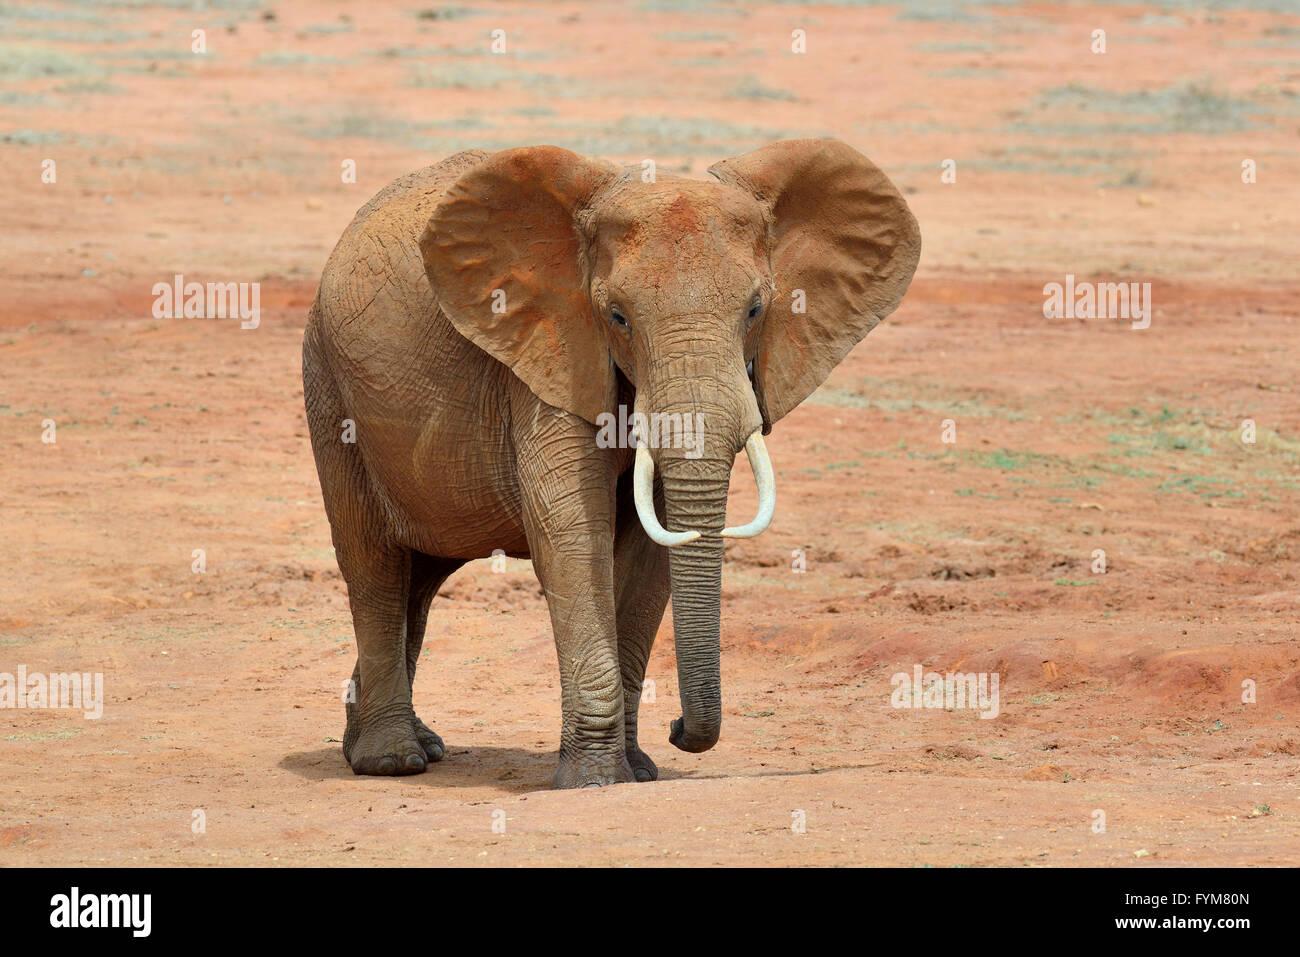 Elefante nel parco nazionale del Kenya, Africa Immagini Stock